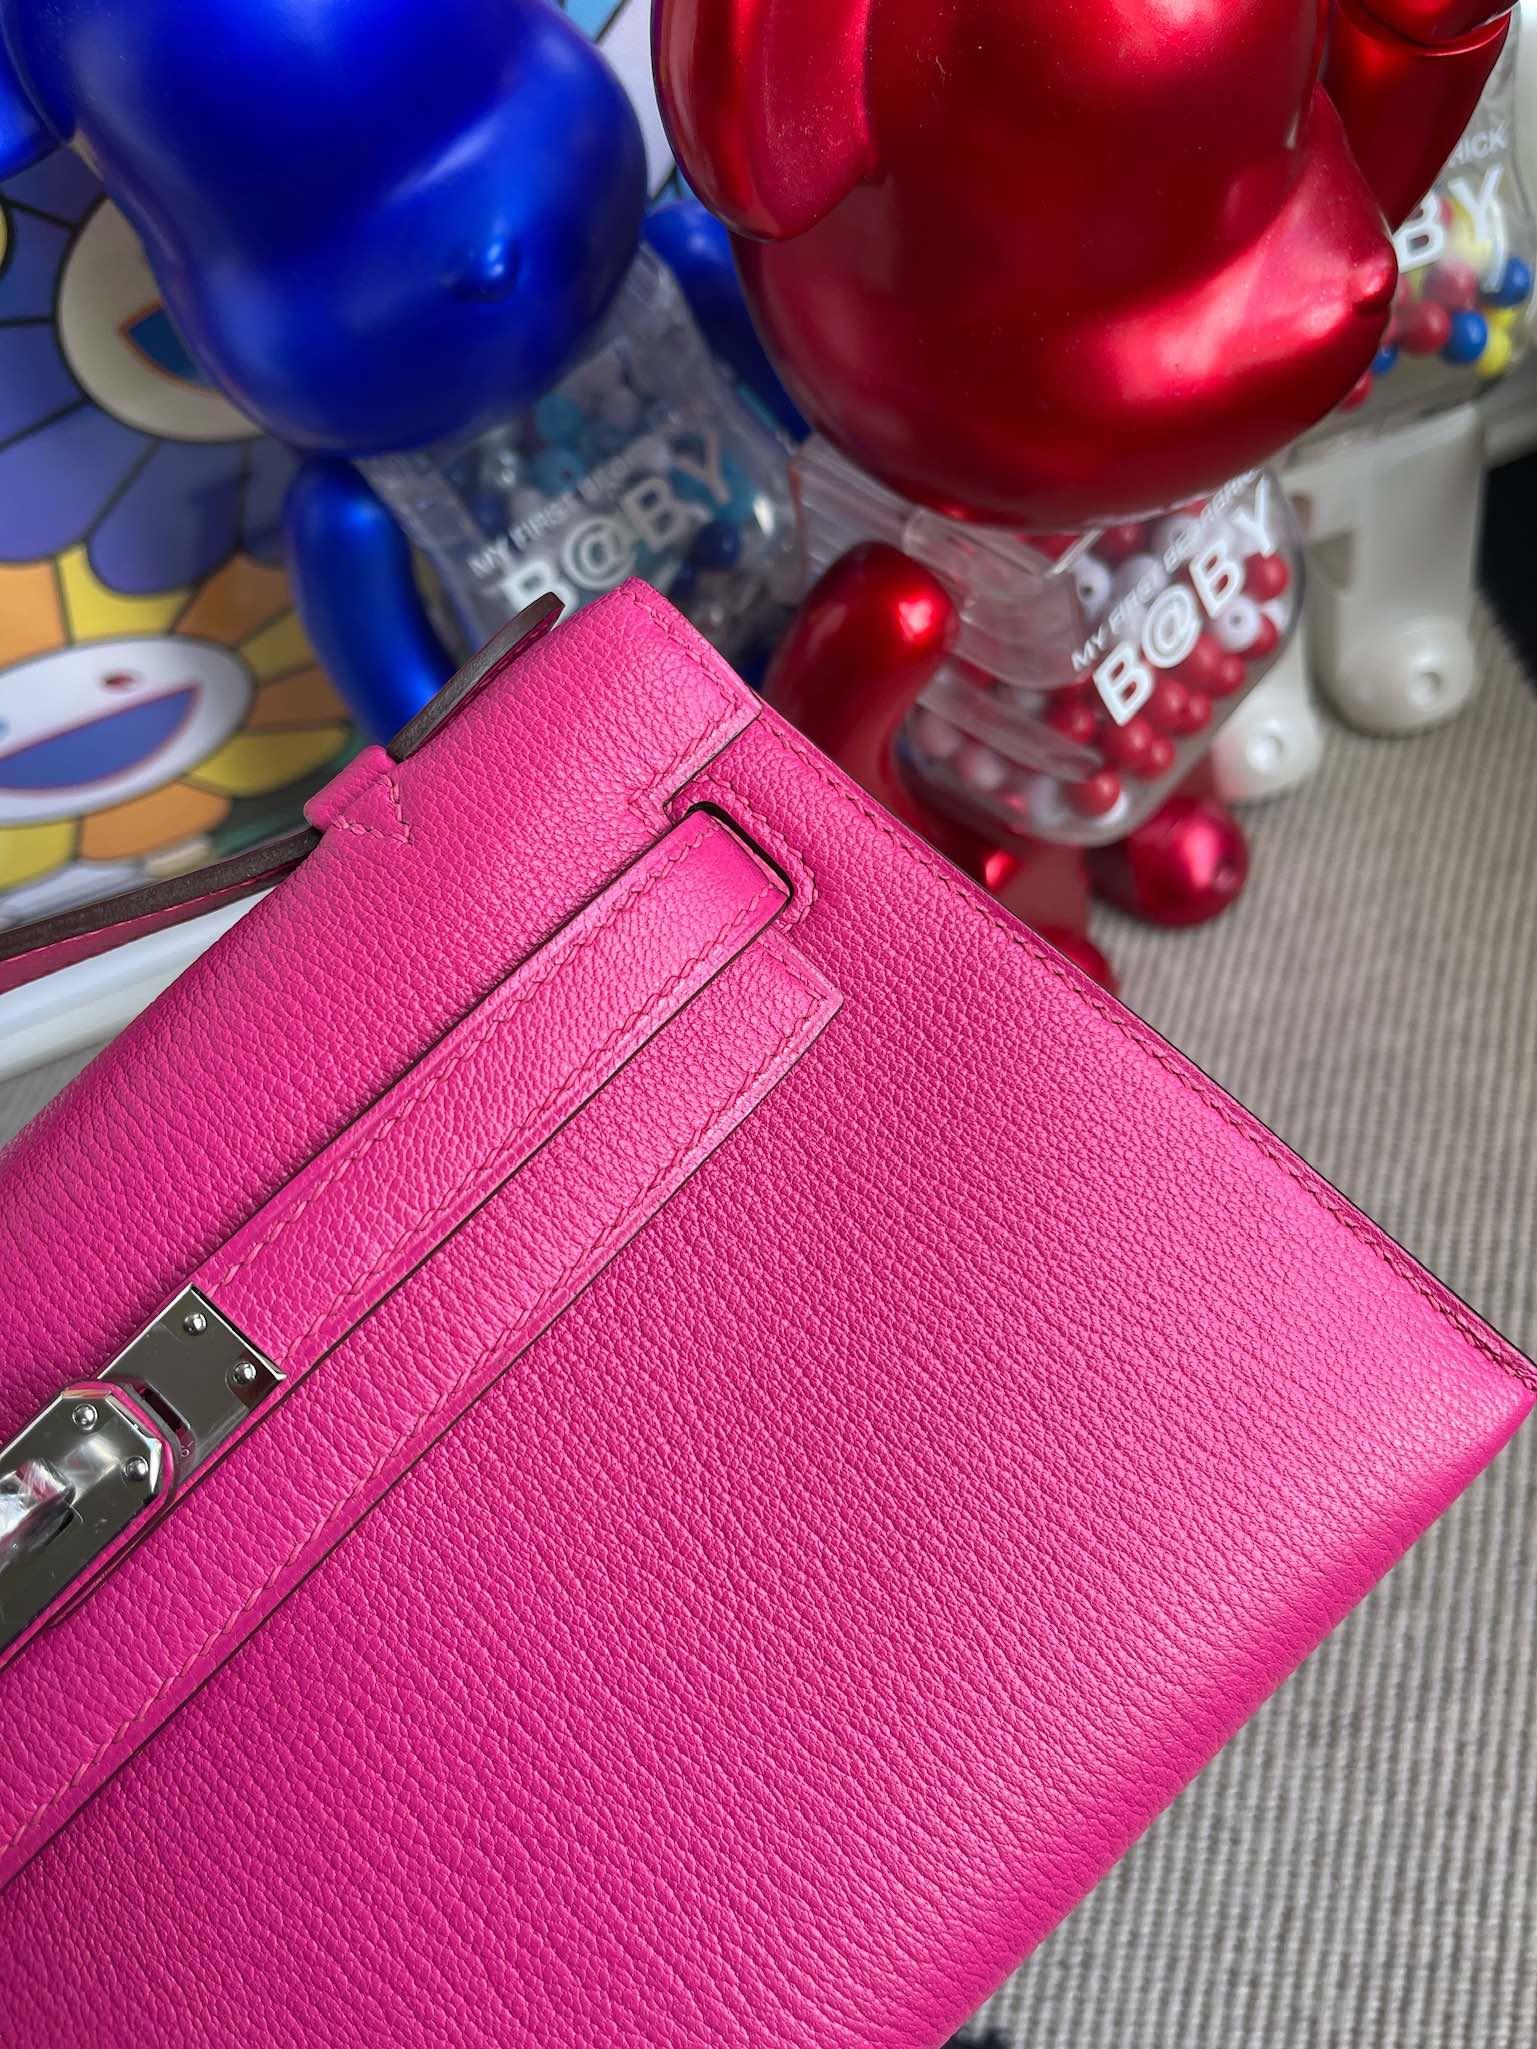 Hermès(爱马仕)Mini kelly pochette Chevre 山羊皮 糖果粉 银扣 22cm 顶级手缝